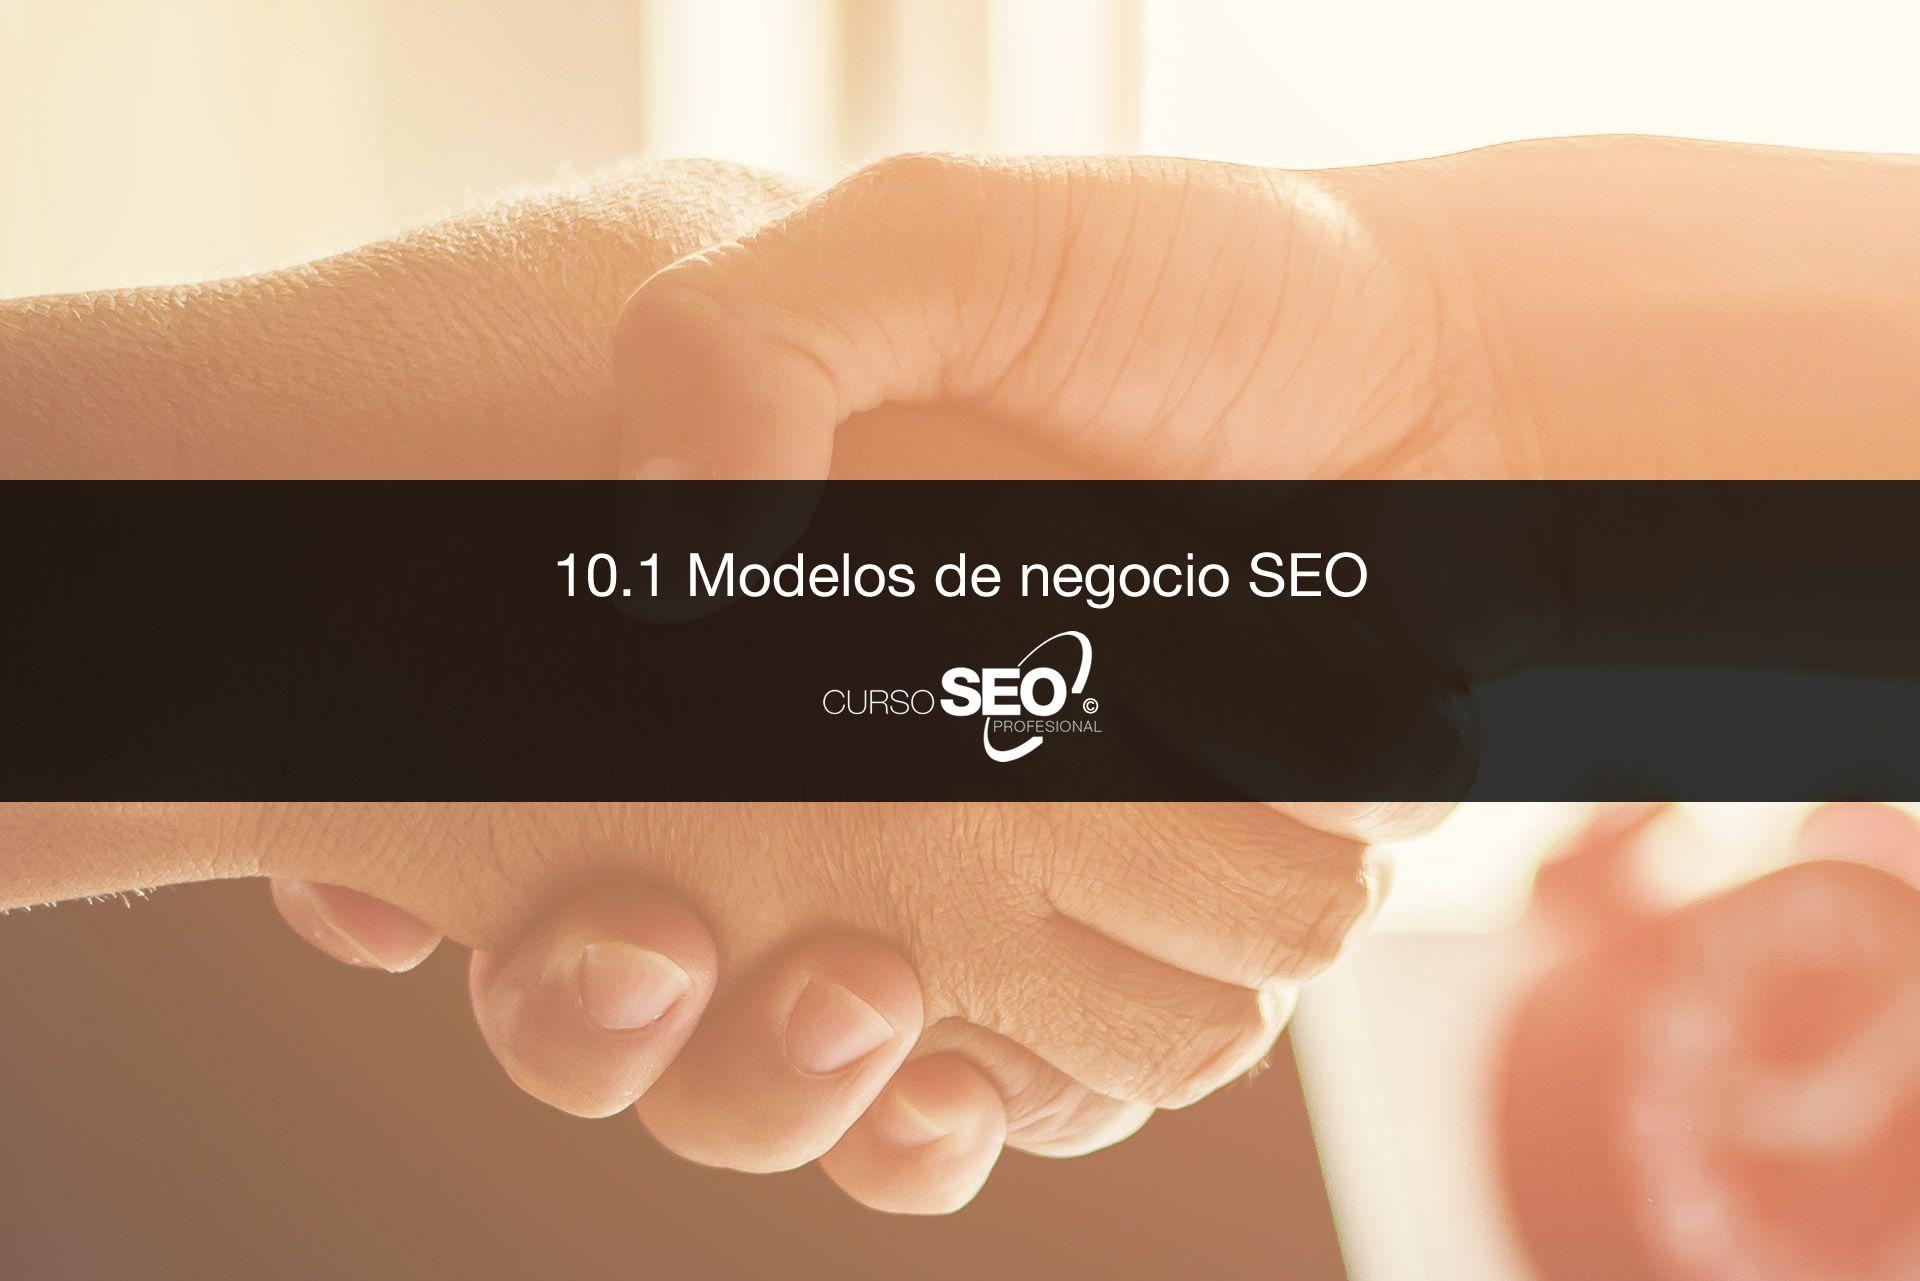 10.1 Modelos de negocio SEO